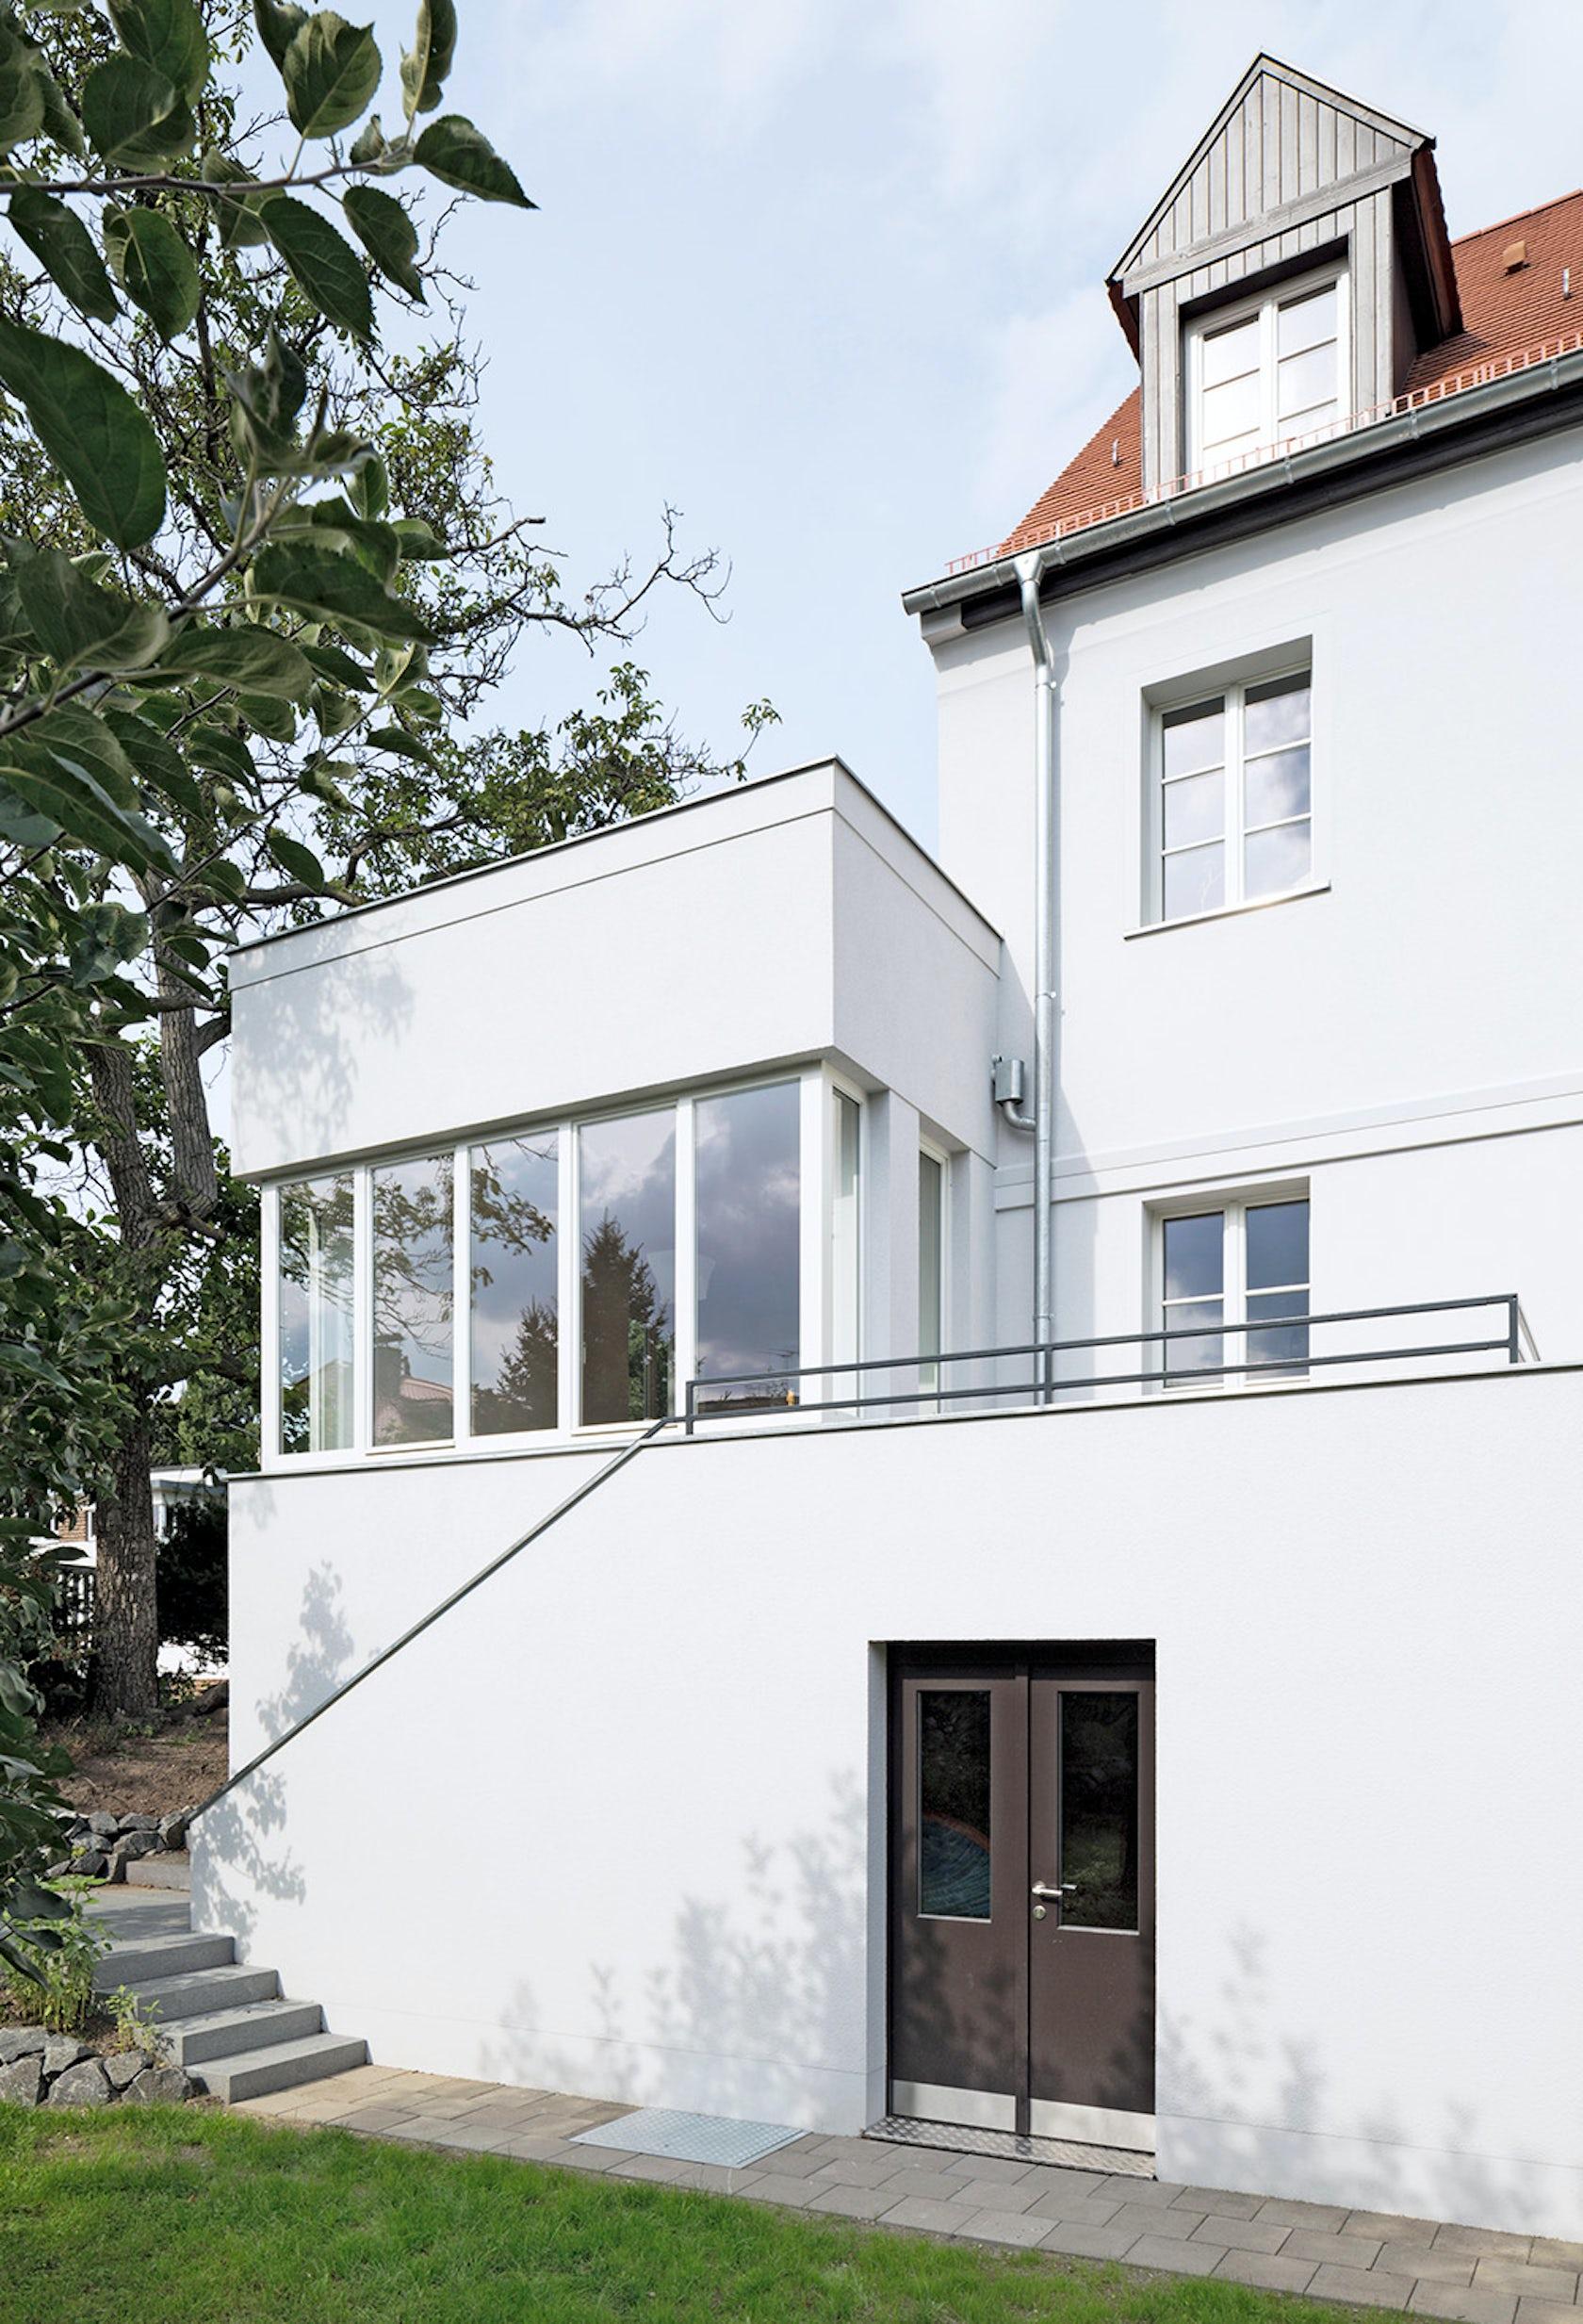 Haus am auenwald architizer for Auenwald leipzig